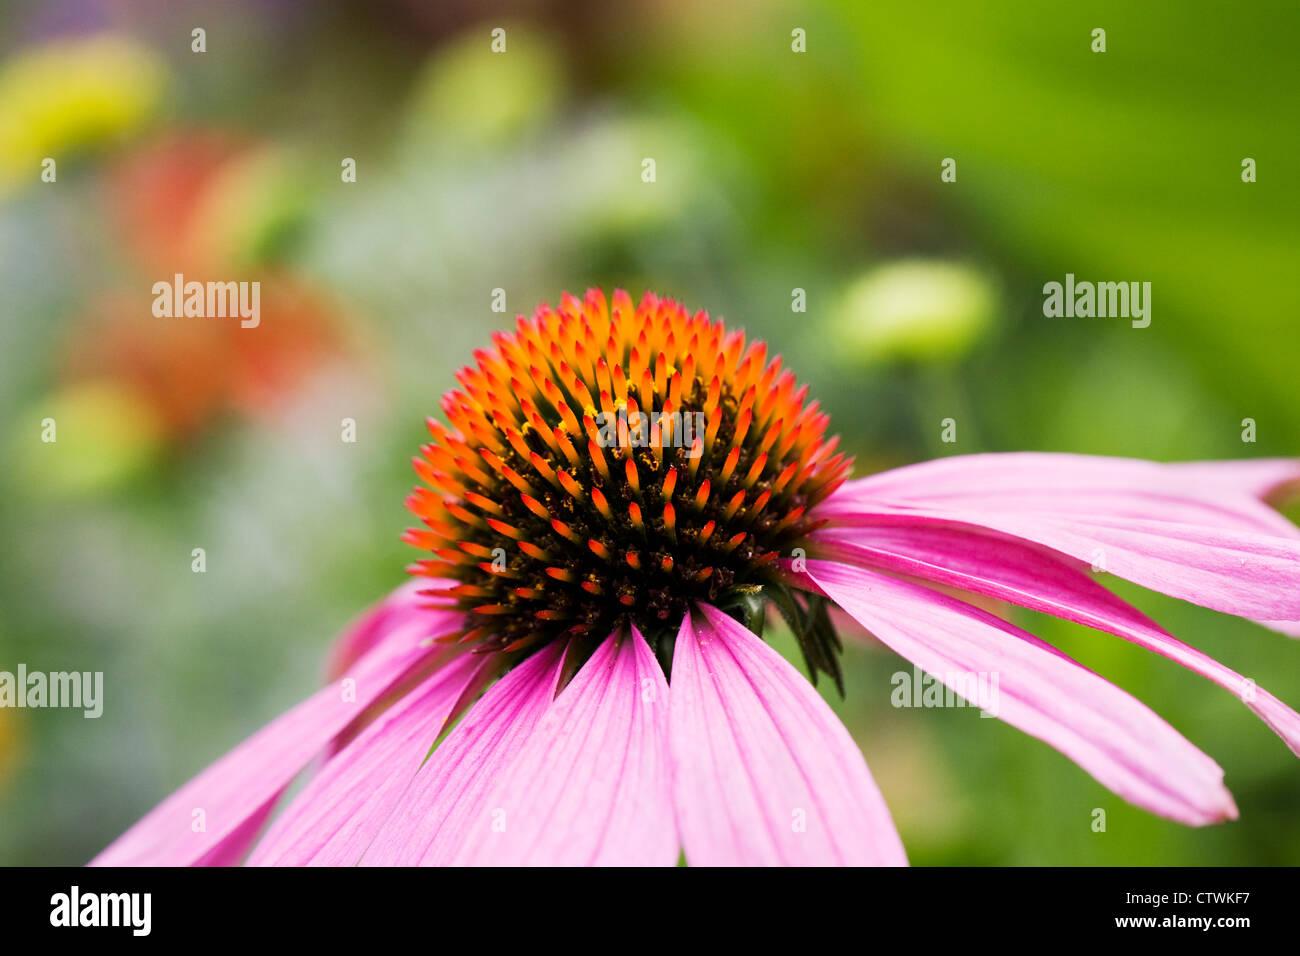 Echinacea purpurea flower head in an herbaceous border. Coneflower. - Stock Image